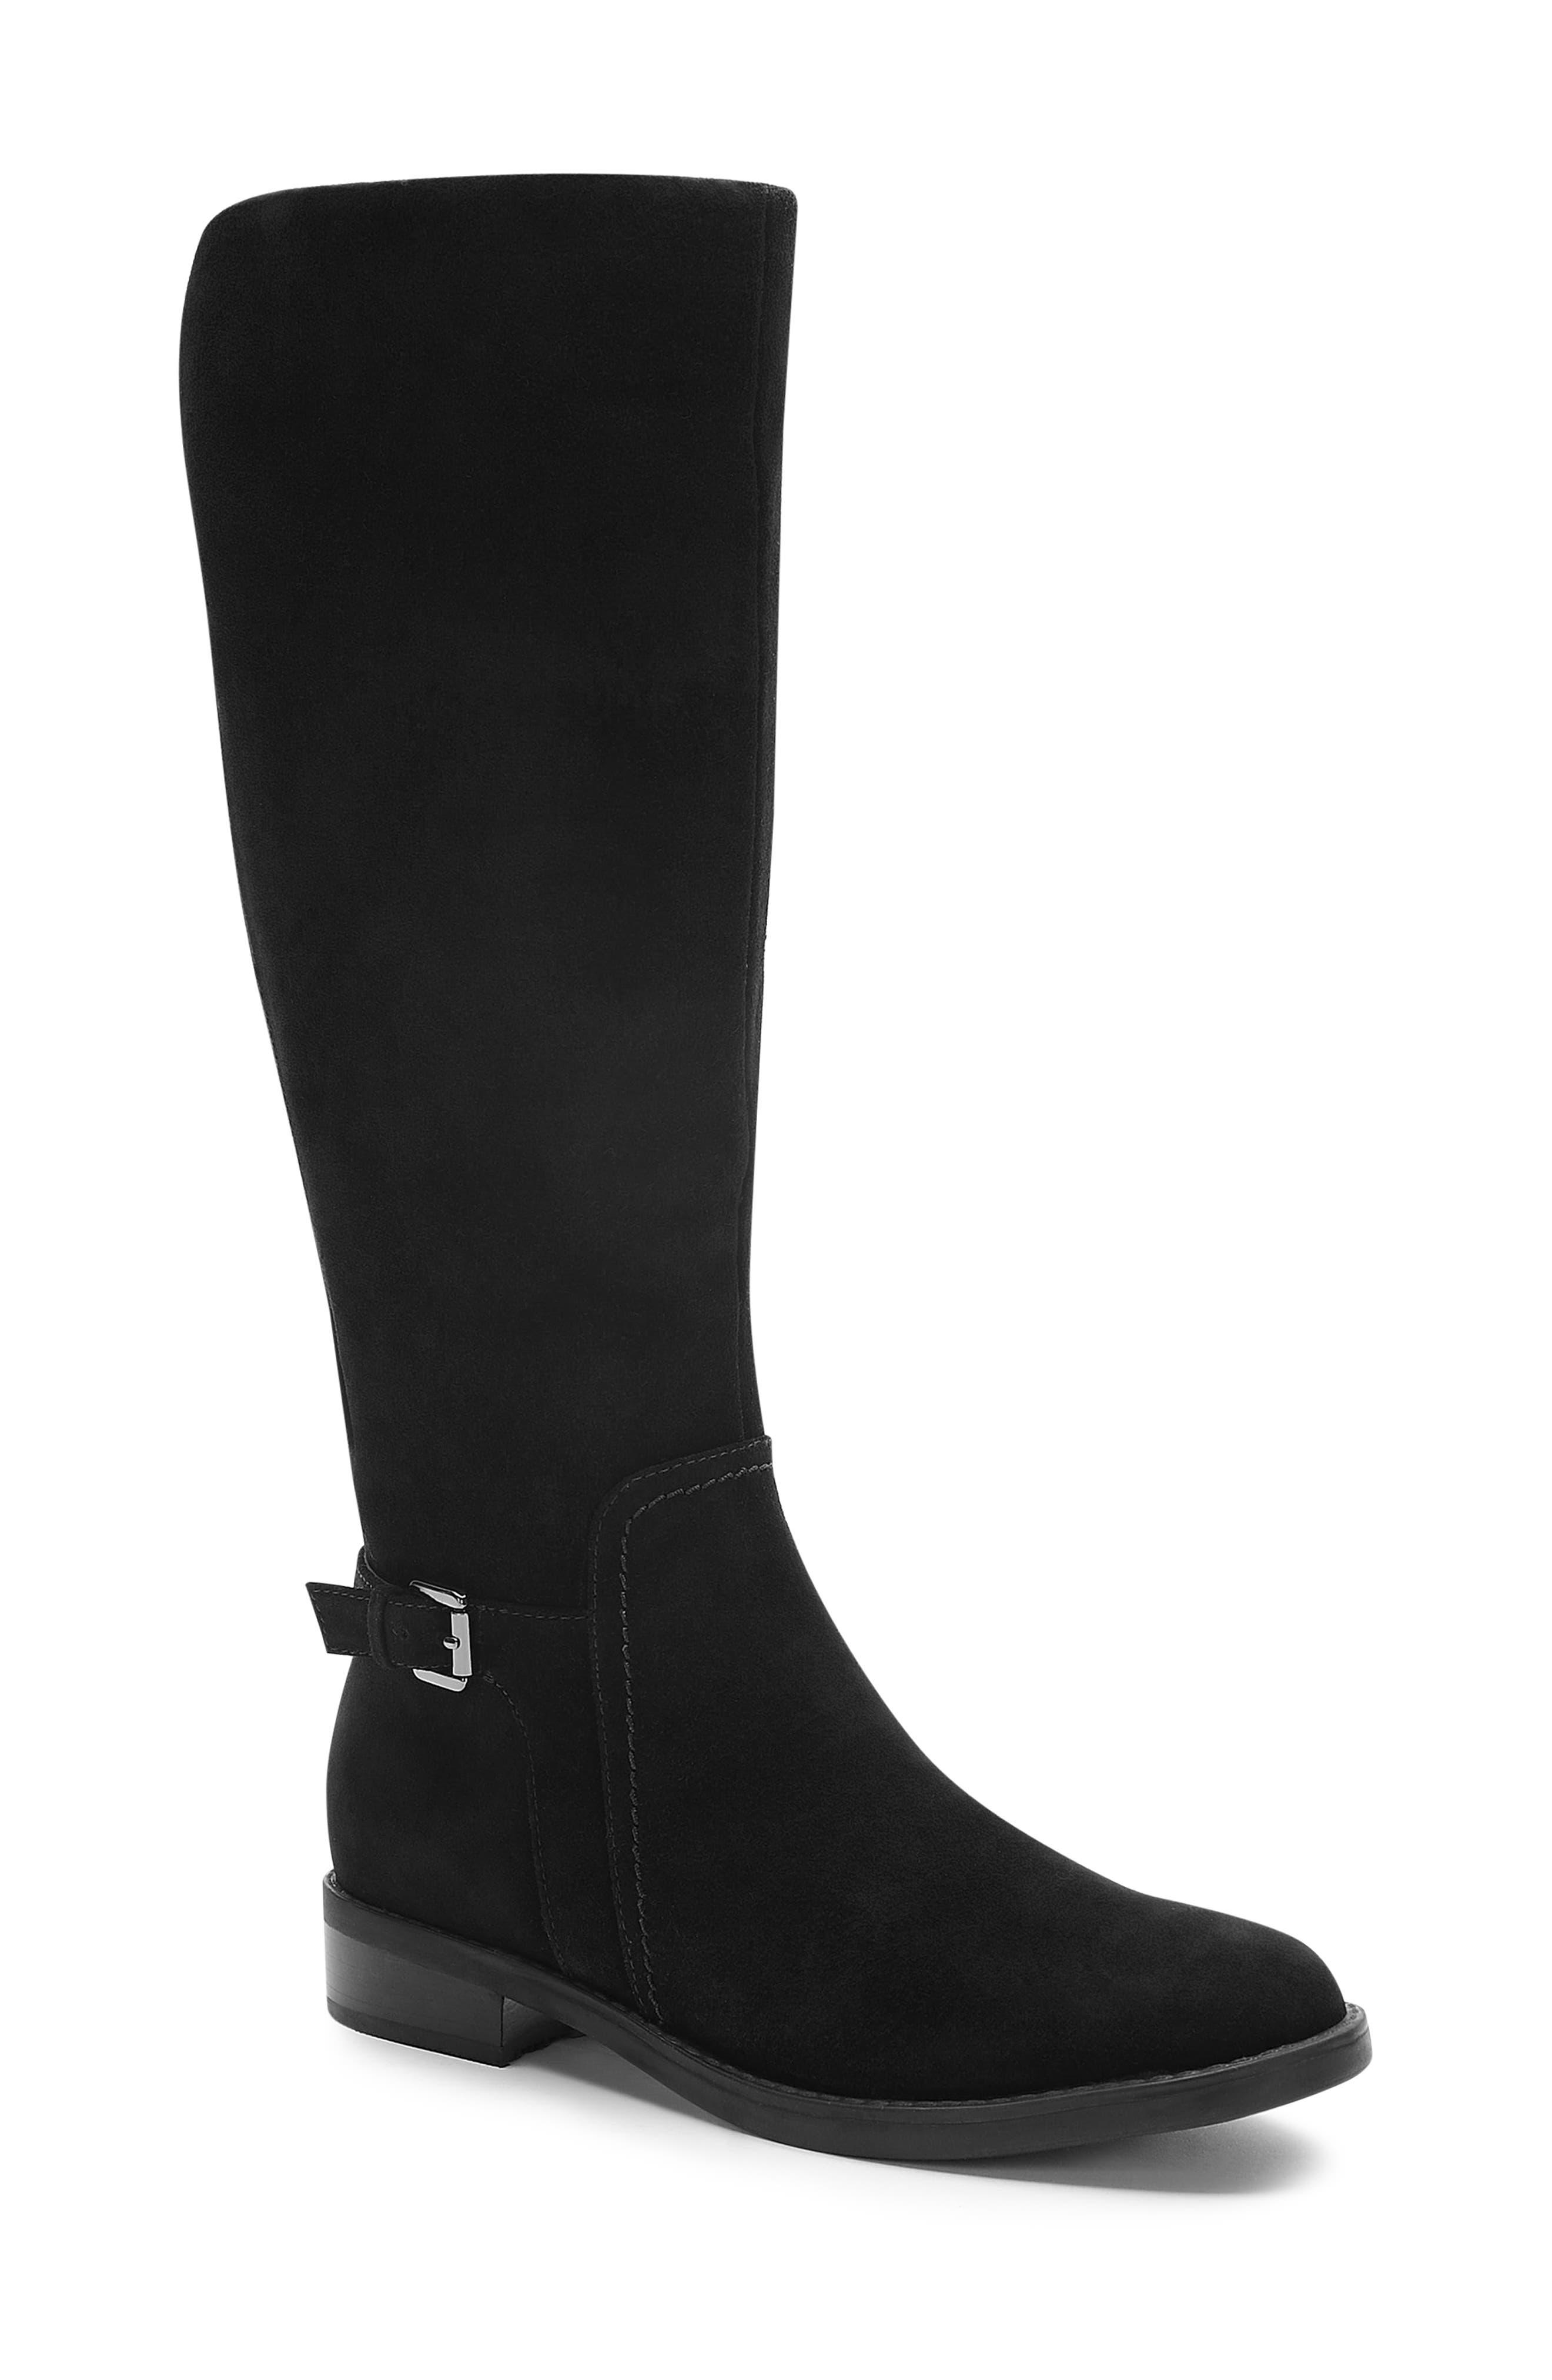 Evie Riding Boot,                             Main thumbnail 1, color,                             BLACK SUEDE